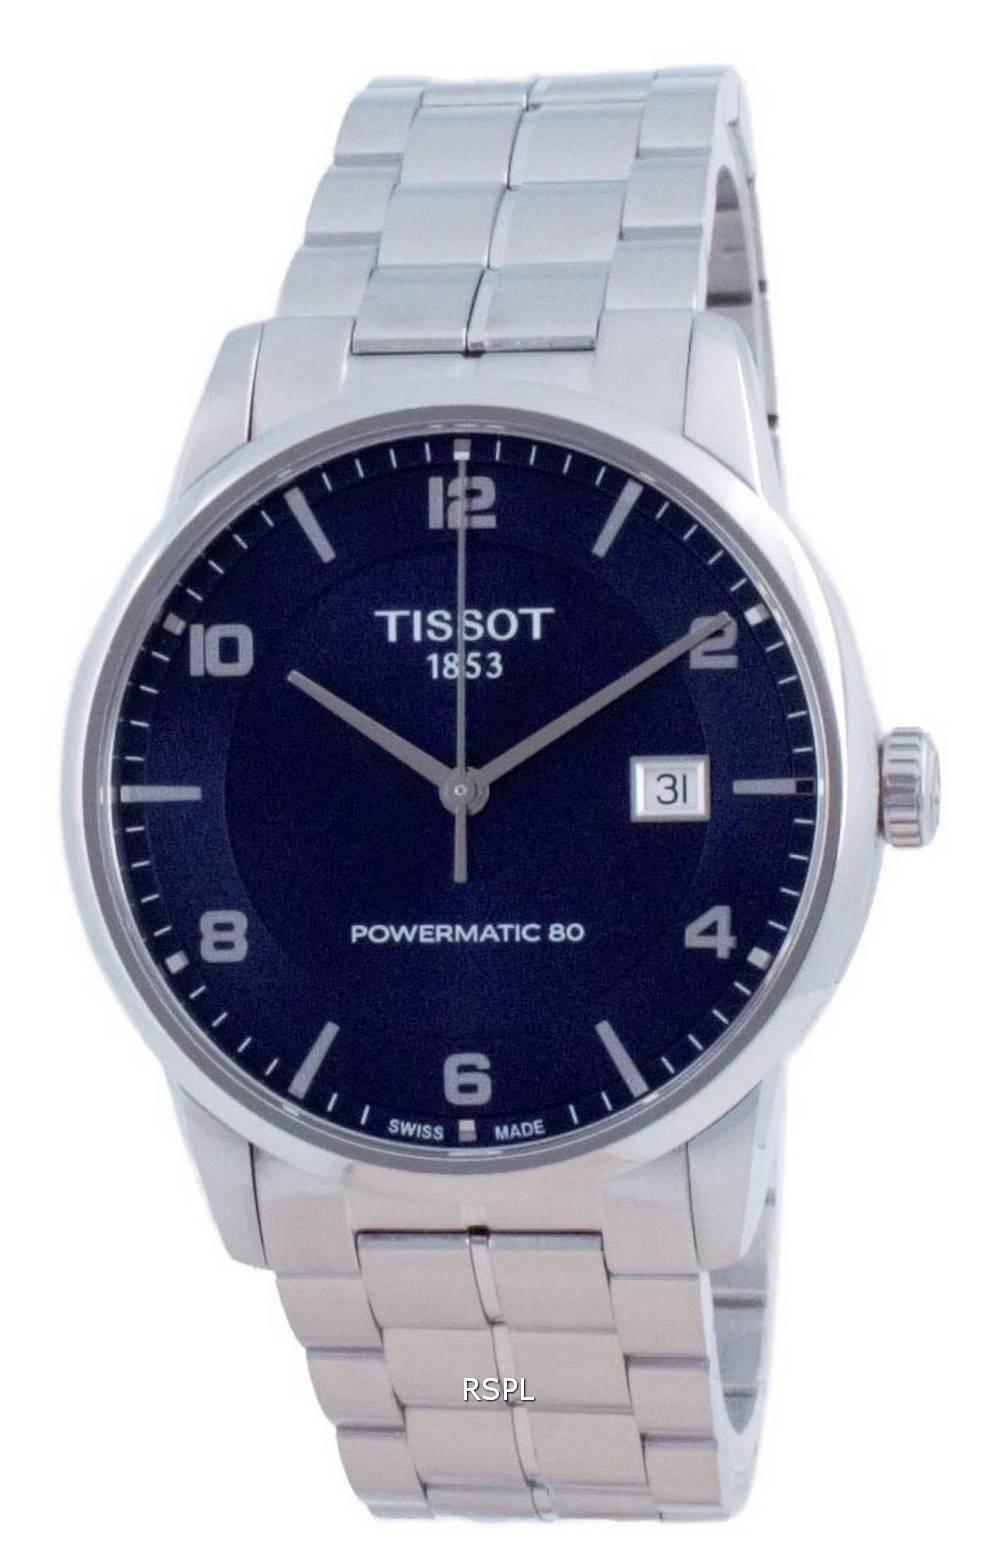 Tissot T-Classic Luxury Powermatic 80 automaattinen T086.407.11.047.00 T0864071104700 miesten kello